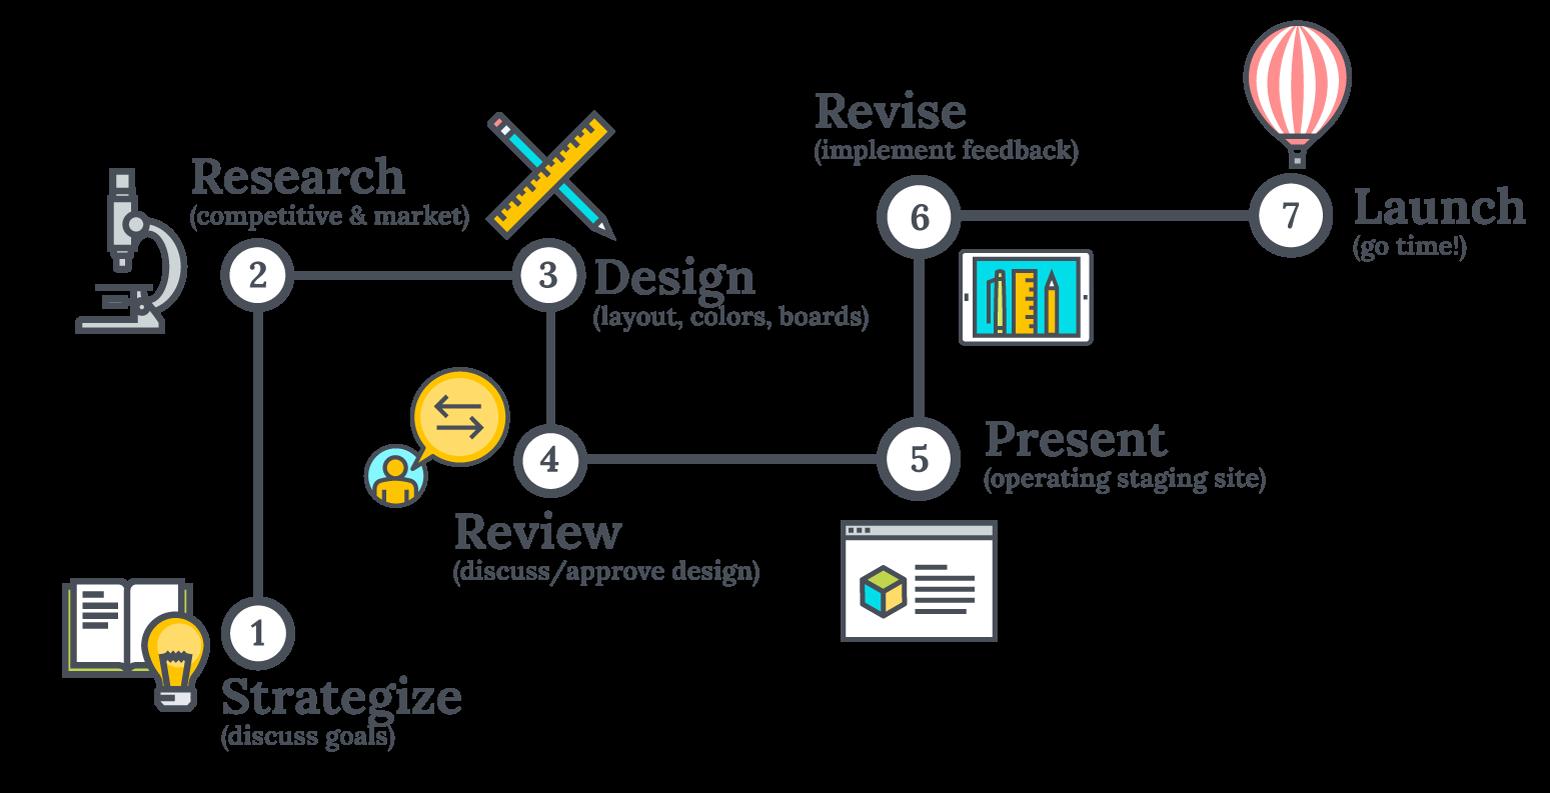 web-process/vibeosys